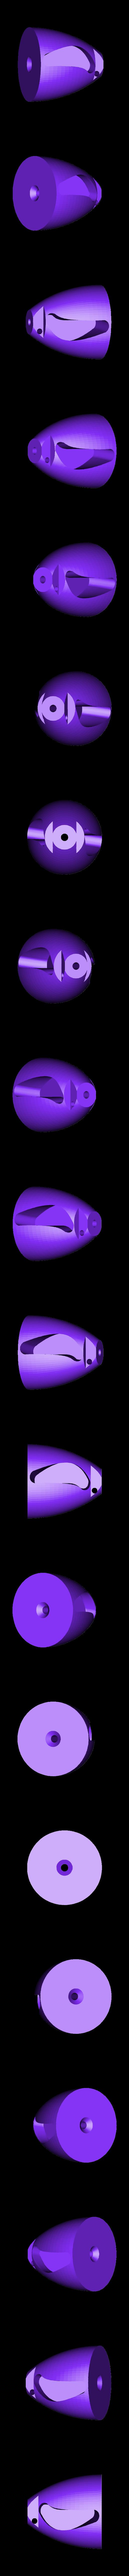 Spinner Hub 1.5.stl Download free STL file Flyer Mk. 1a Modifications • Object to 3D print, billbo1958